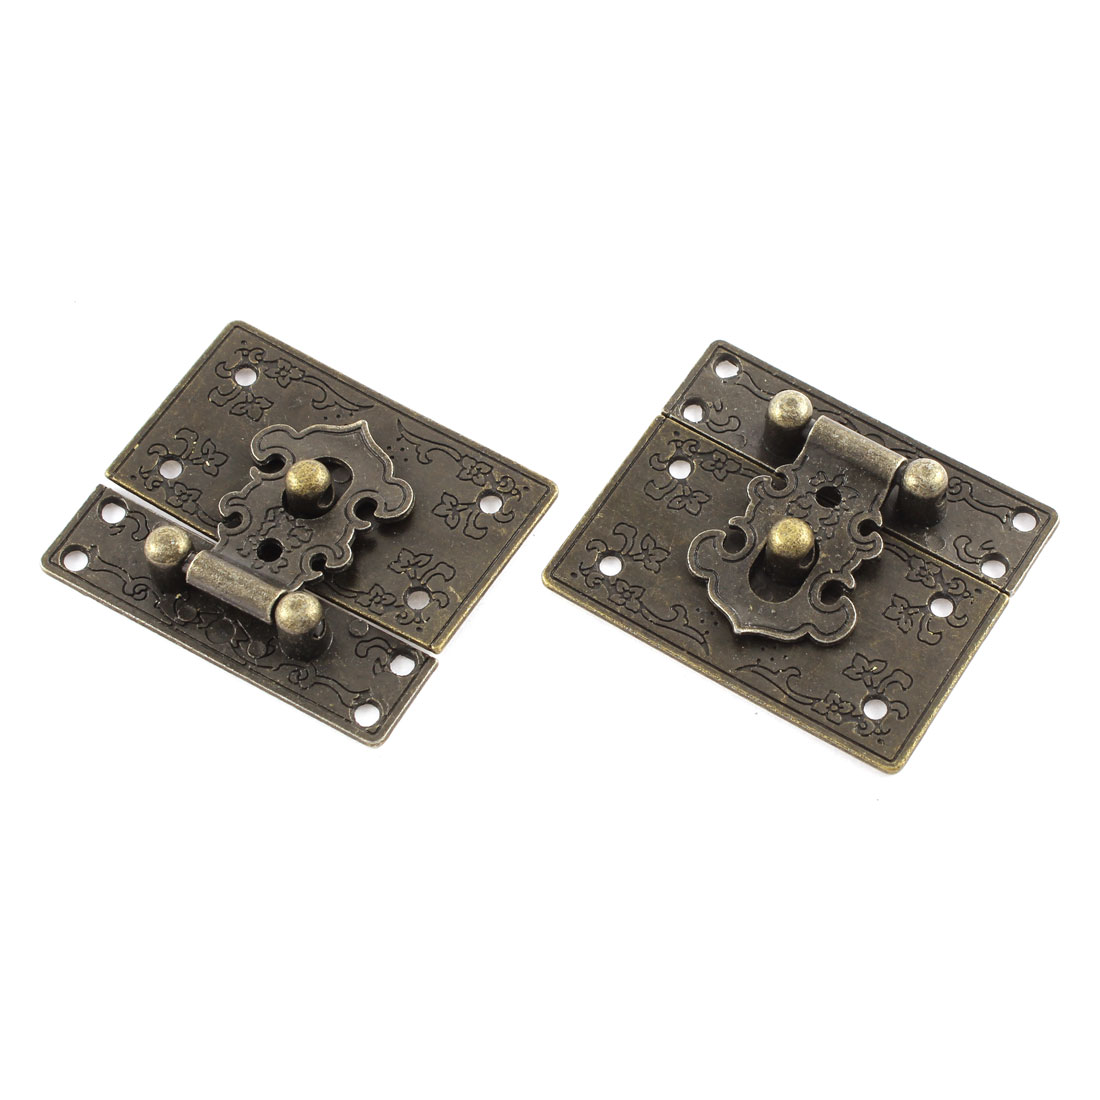 2pcs 55mmx47mm Vintage Style Jewelry Box Hasp Lock Latch w Screws